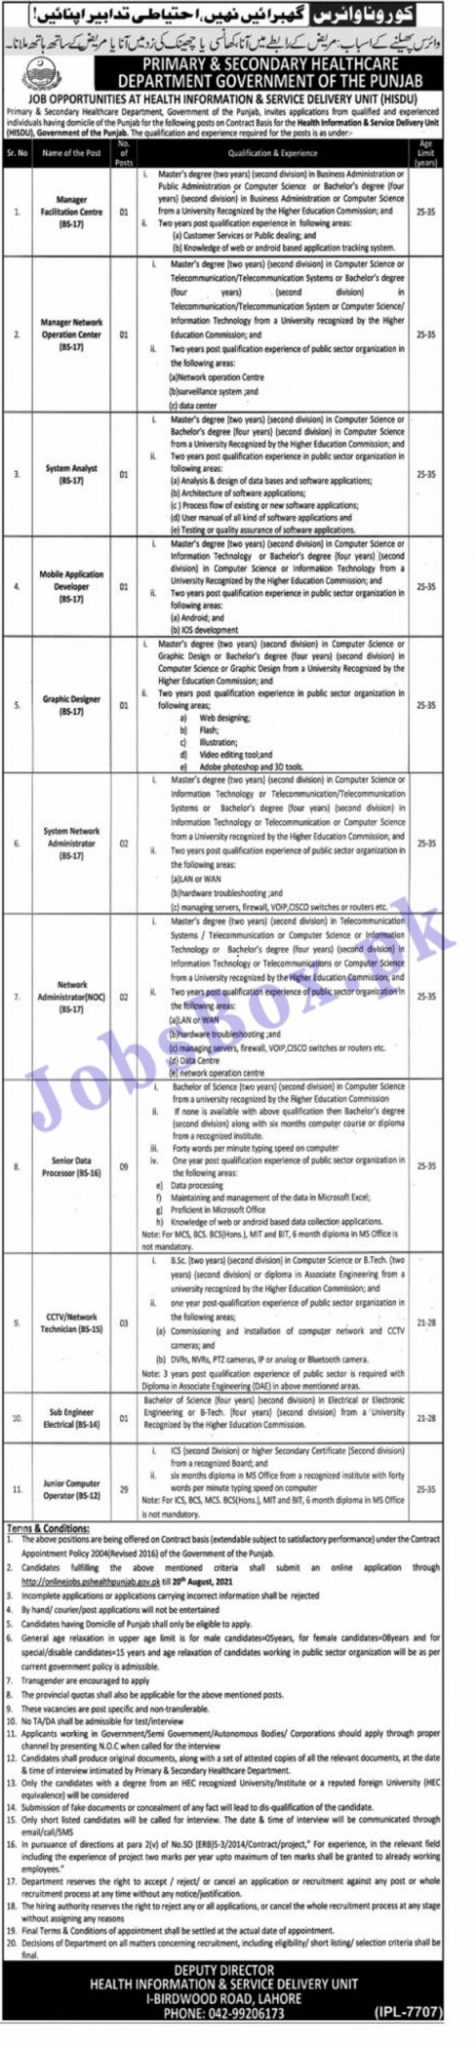 onlinejobs.pshealthpunjab.gov.pk Jobs 2021 - Primary and Secondary Healthcare Department Punjab Jobs 2021 in Pakistan